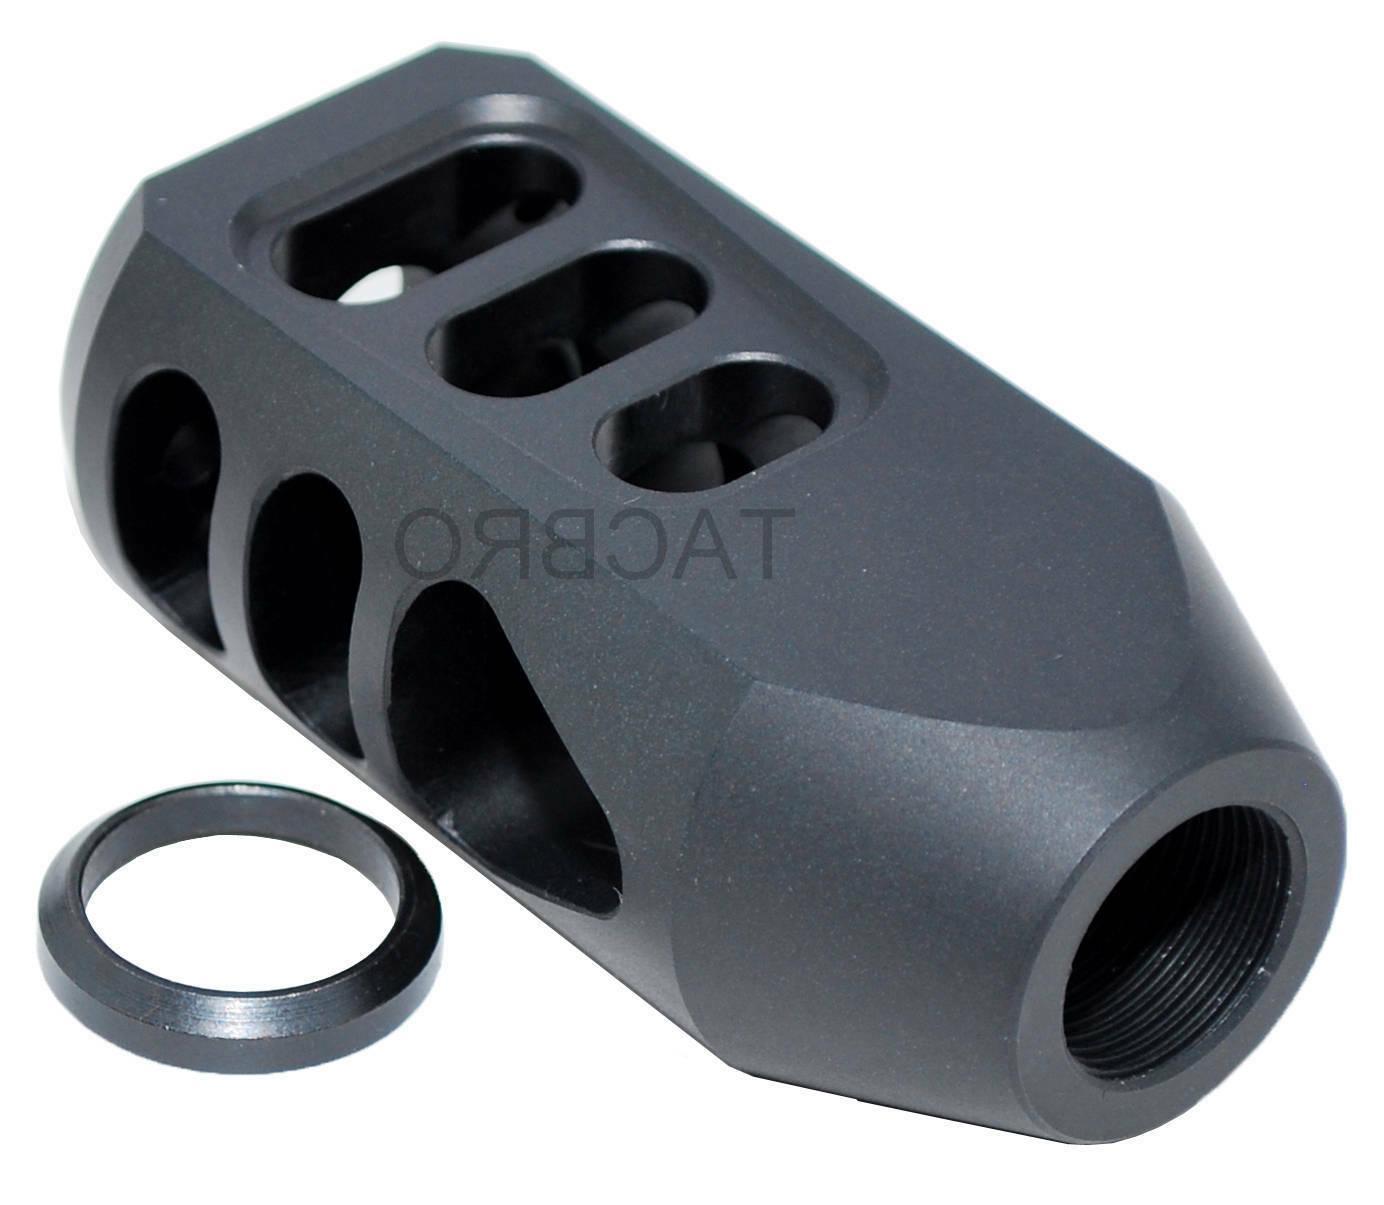 "6.5 Creedmoor Black Aluminum 5/8""x24 Tanker Style Muzzle Bra"